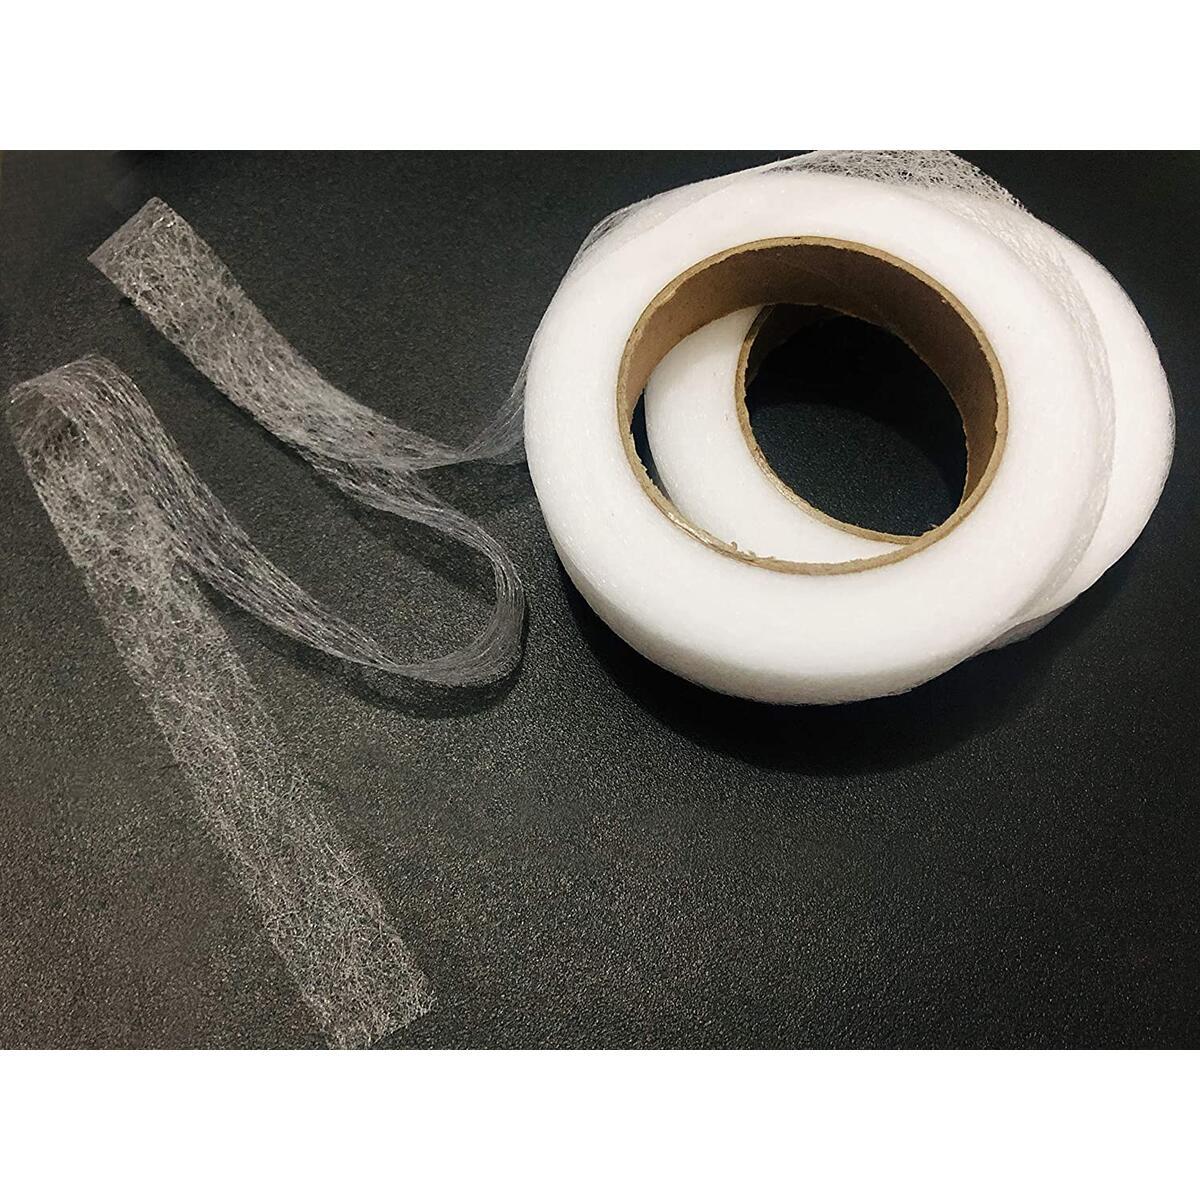 2pcs Hem Iron-On Adhesive Tape Fabric Fusing Tape Each 27 Yards Length, 0.59inch/1.5cm Width